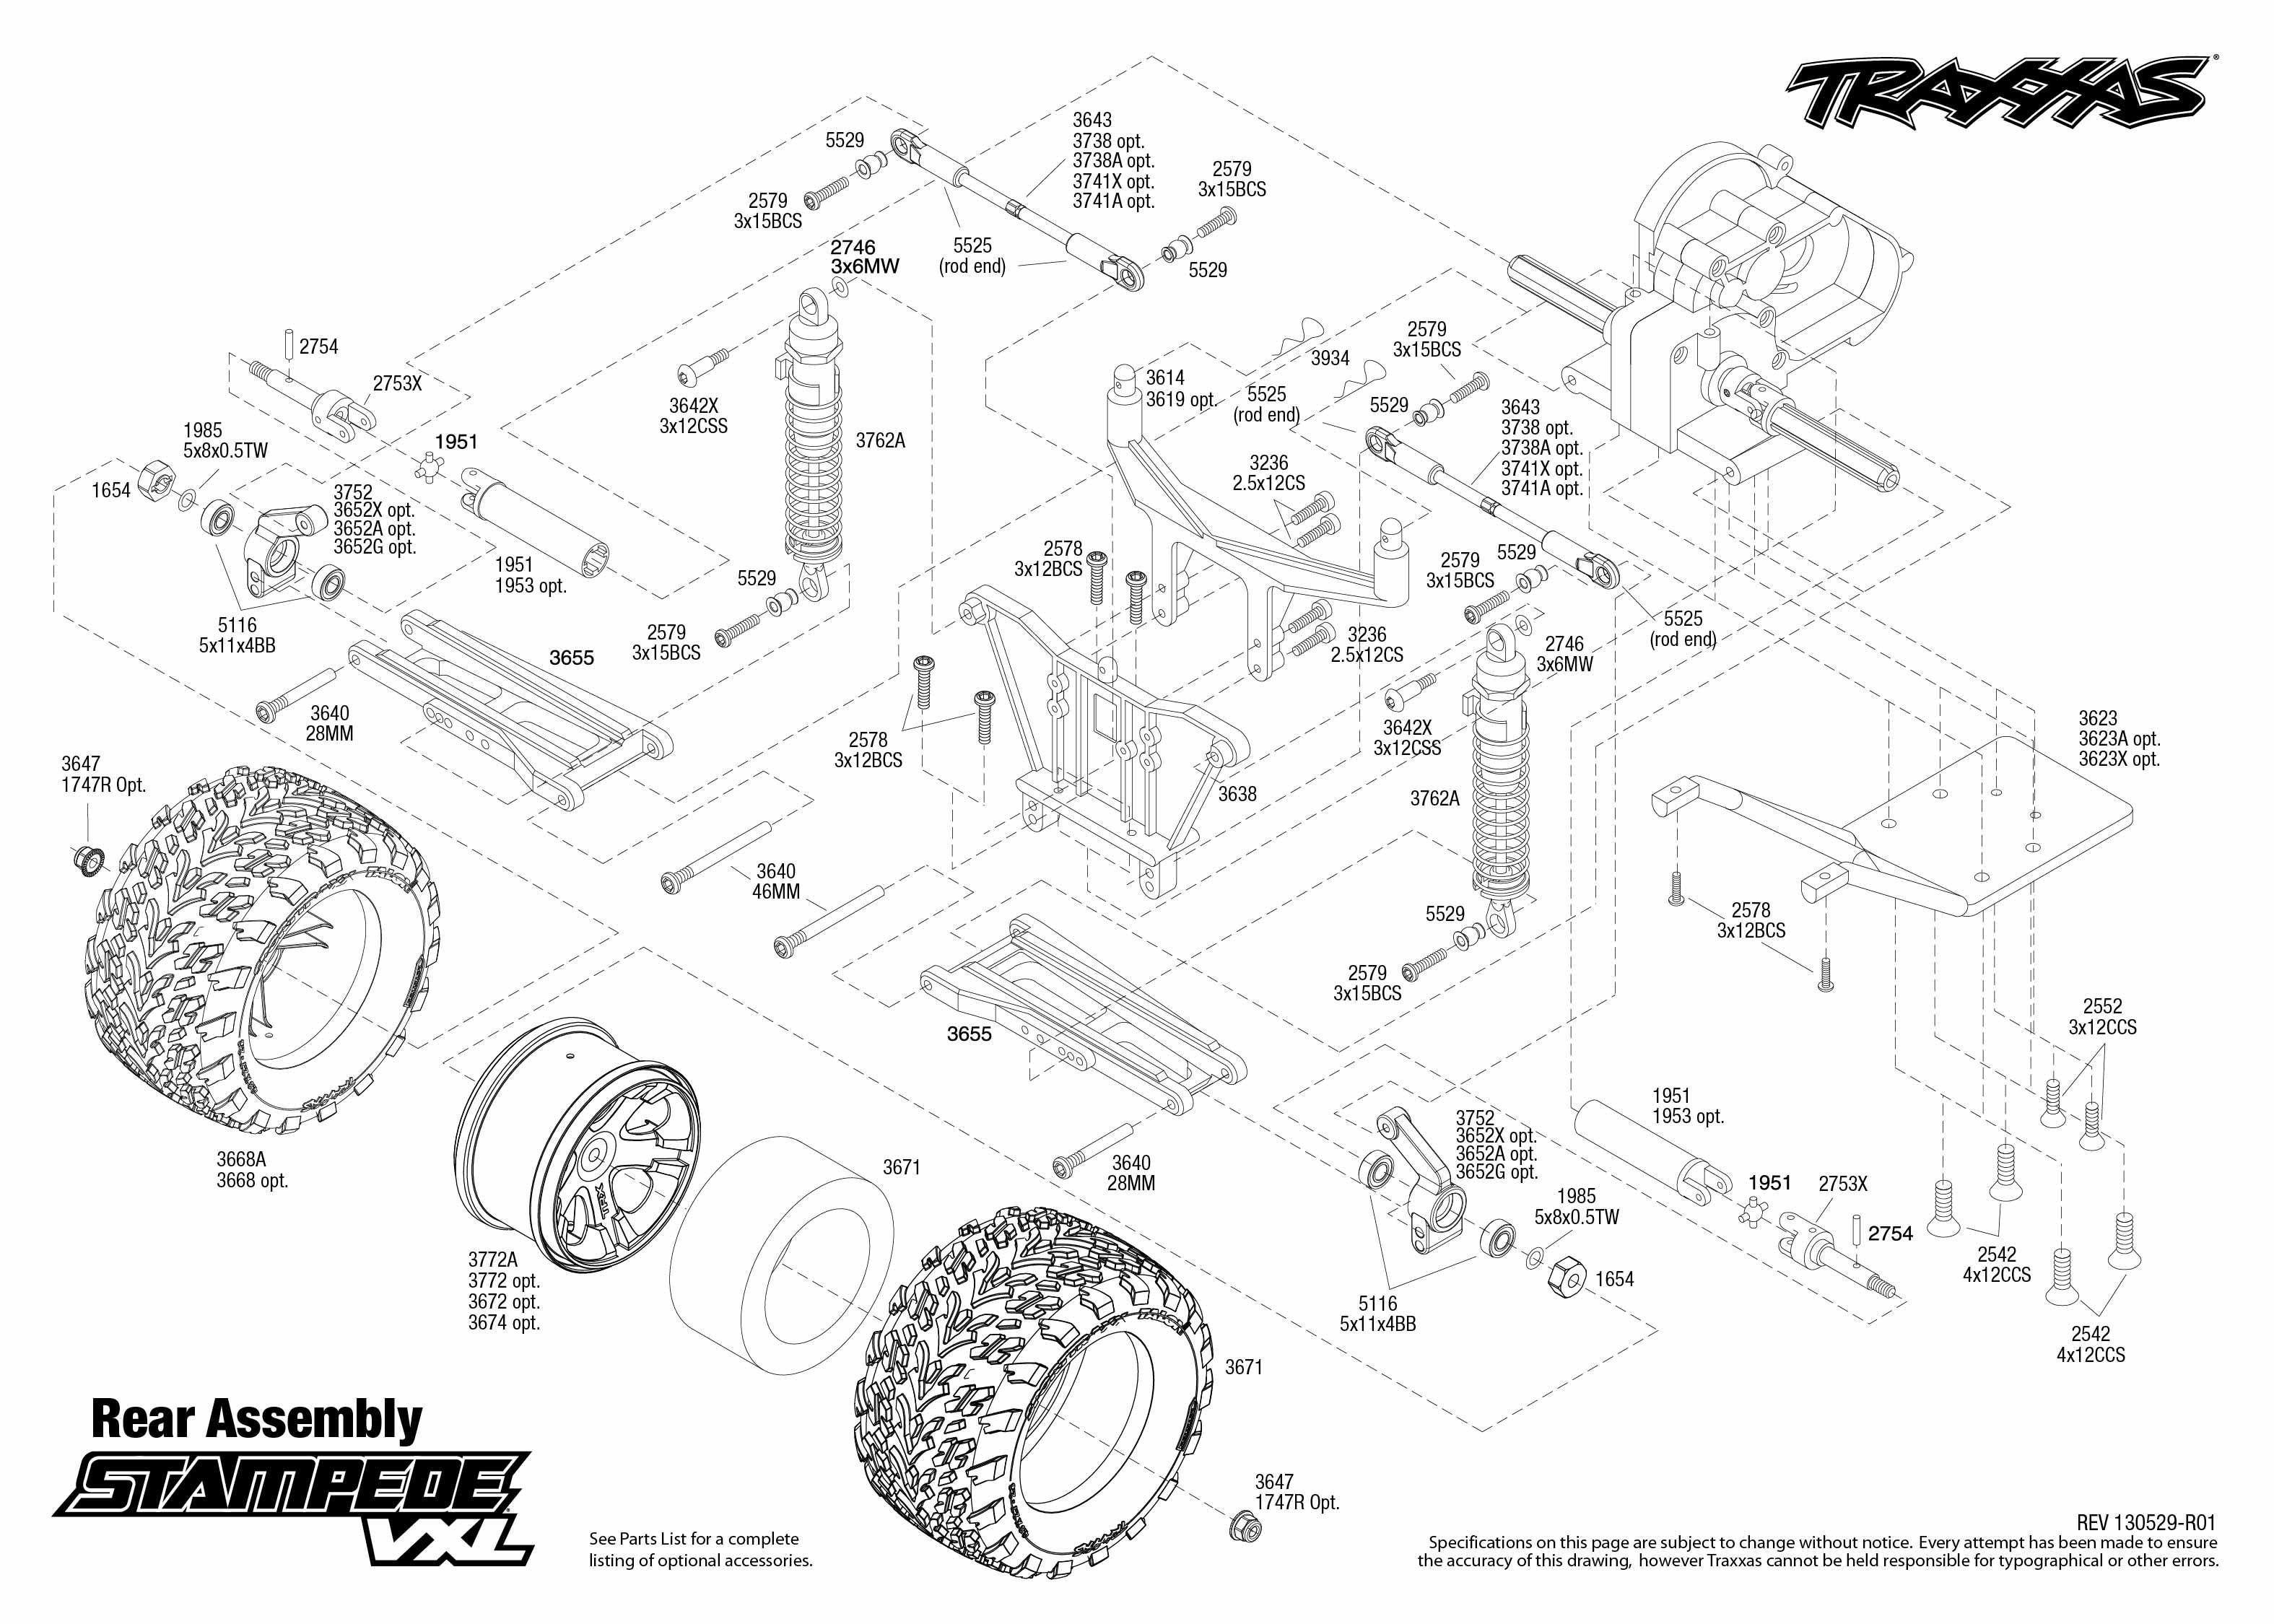 Traxxas Stampede 4x4 Vxl Parts Diagram